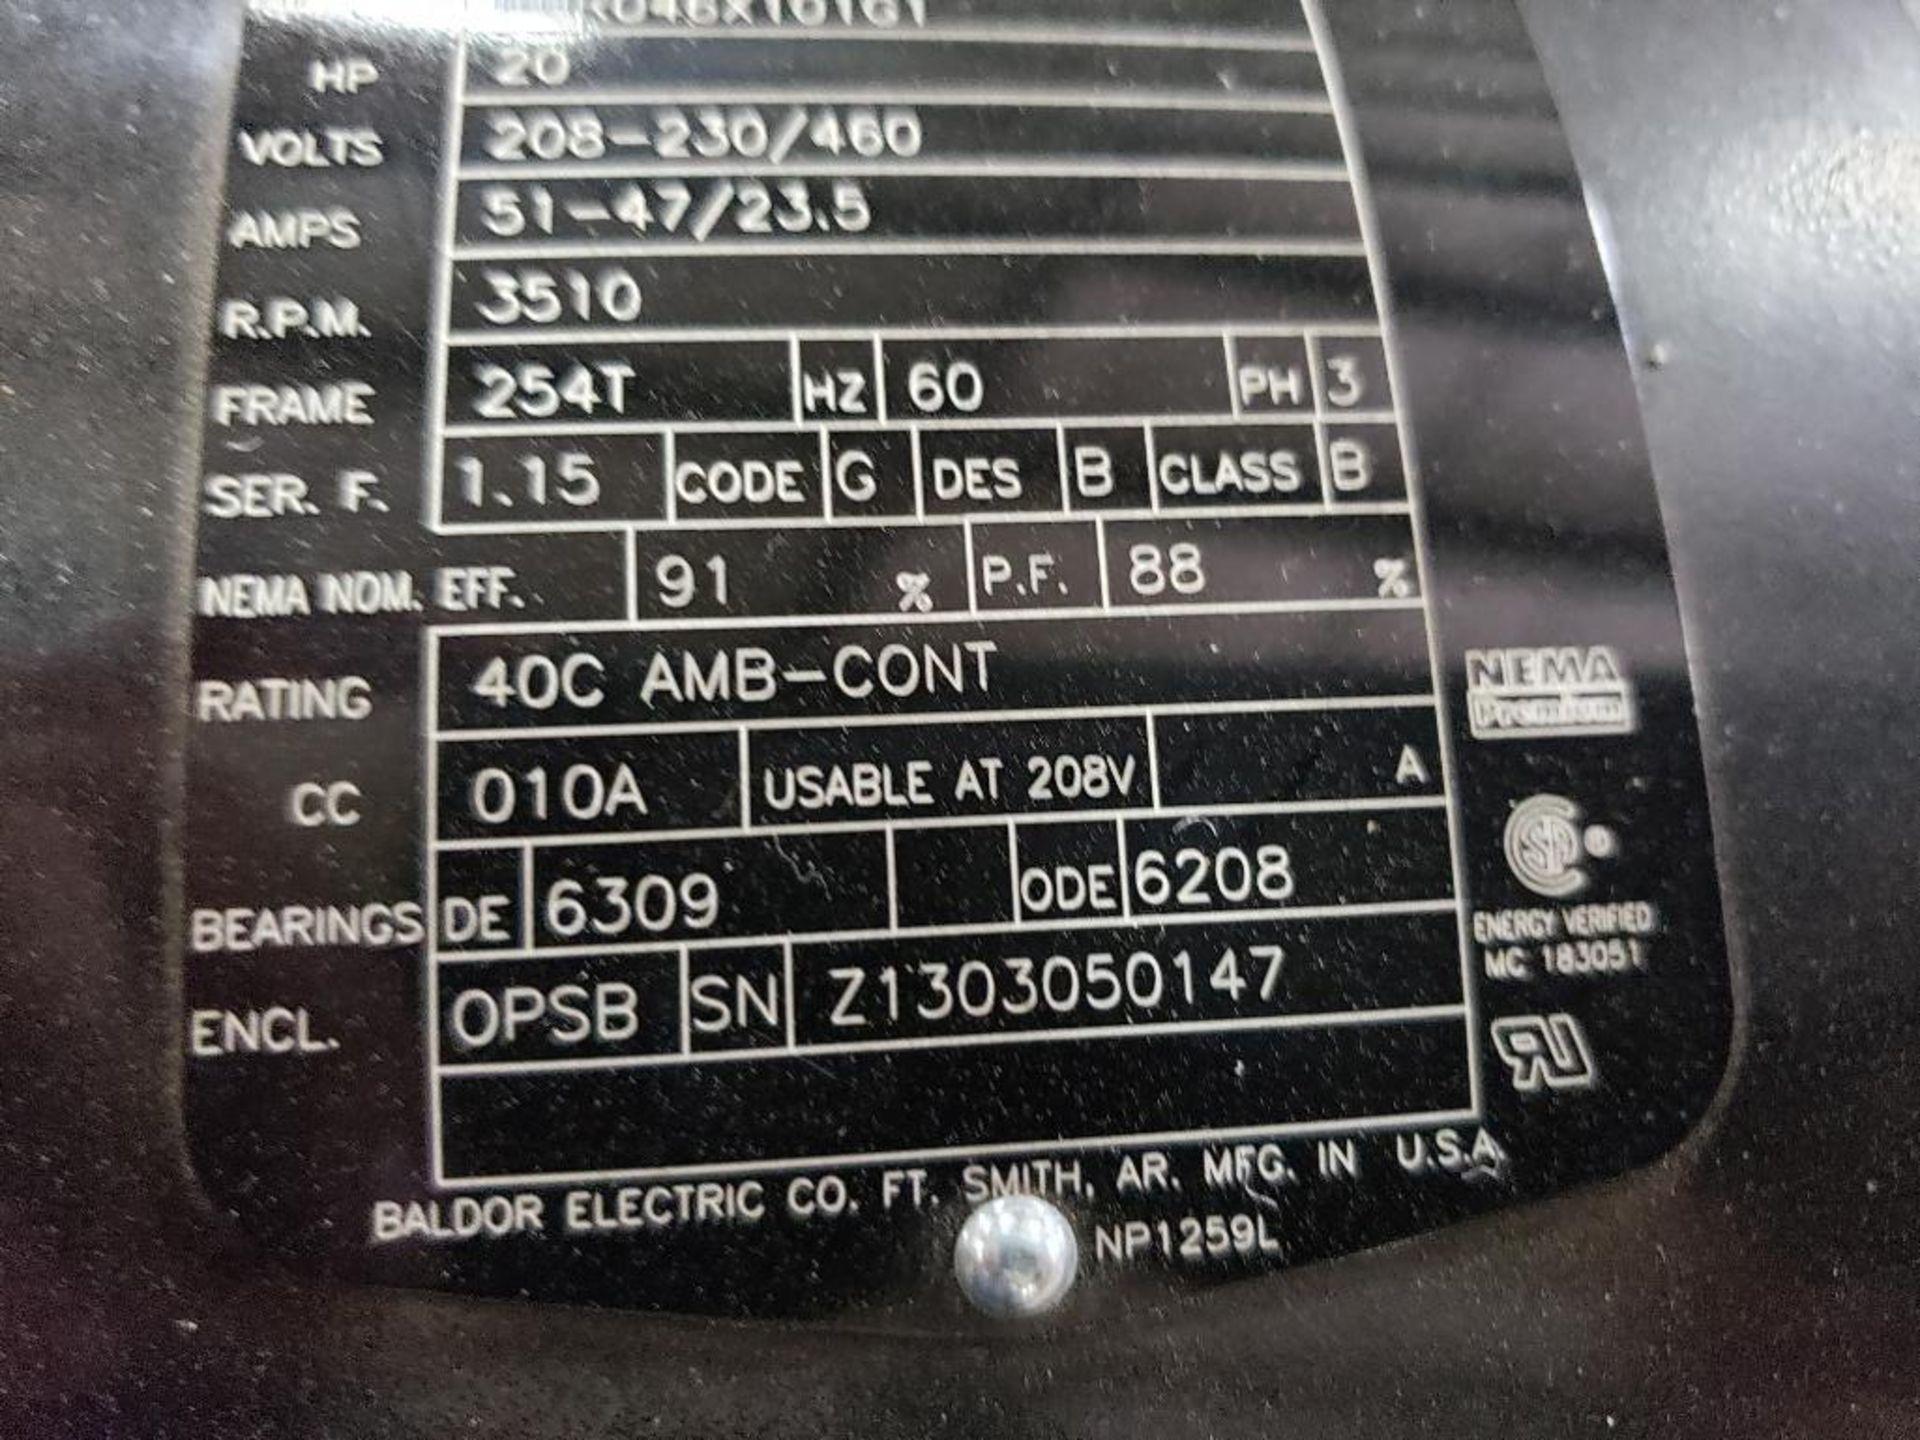 20HP Baldor Reliance 3PH SuperE Motor. 39R046X101G1. 208-230/460V, 3510RPM, 254T-Frame. - Image 5 of 7